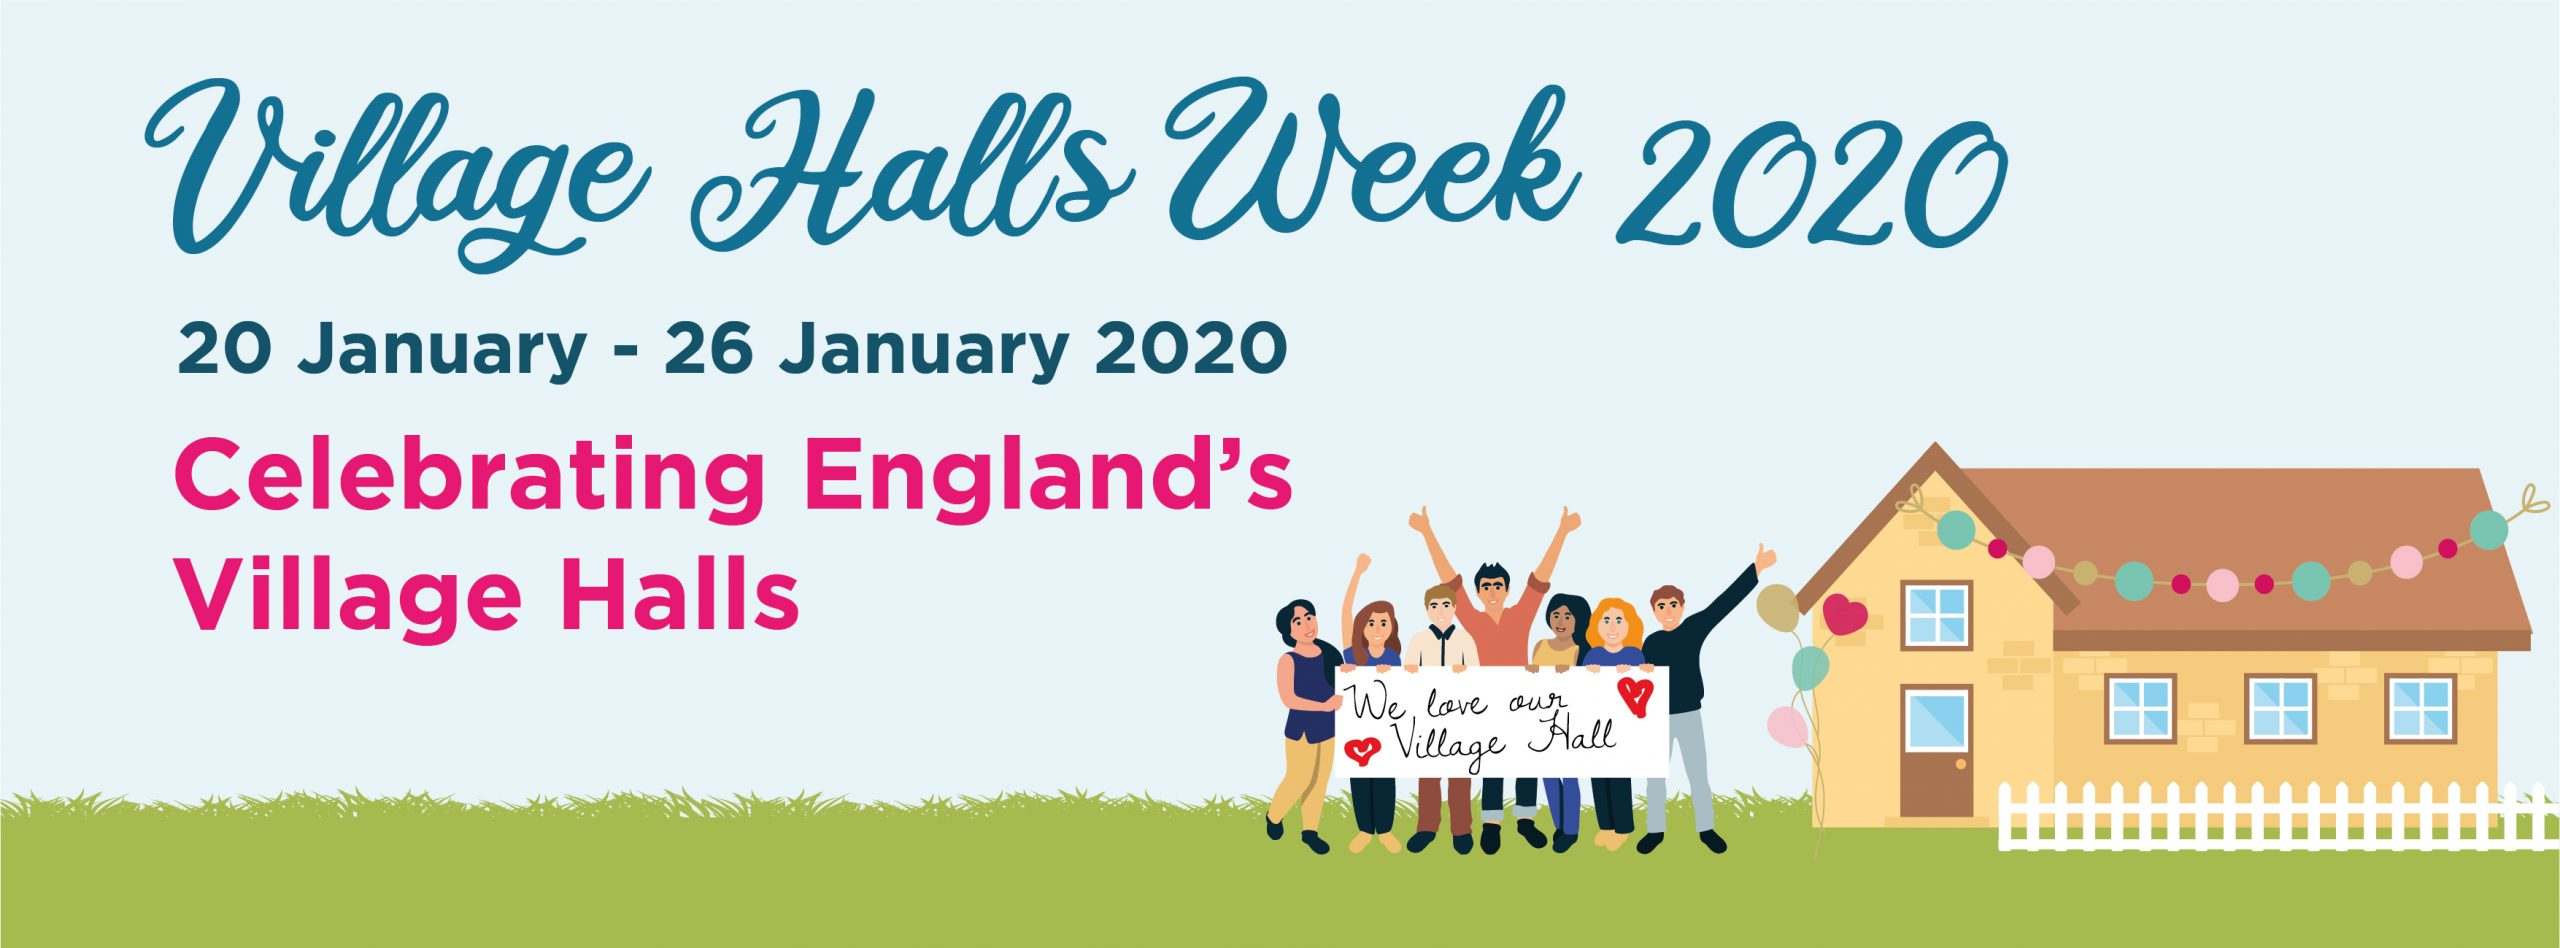 #VillageHallsWeek 2020 its here